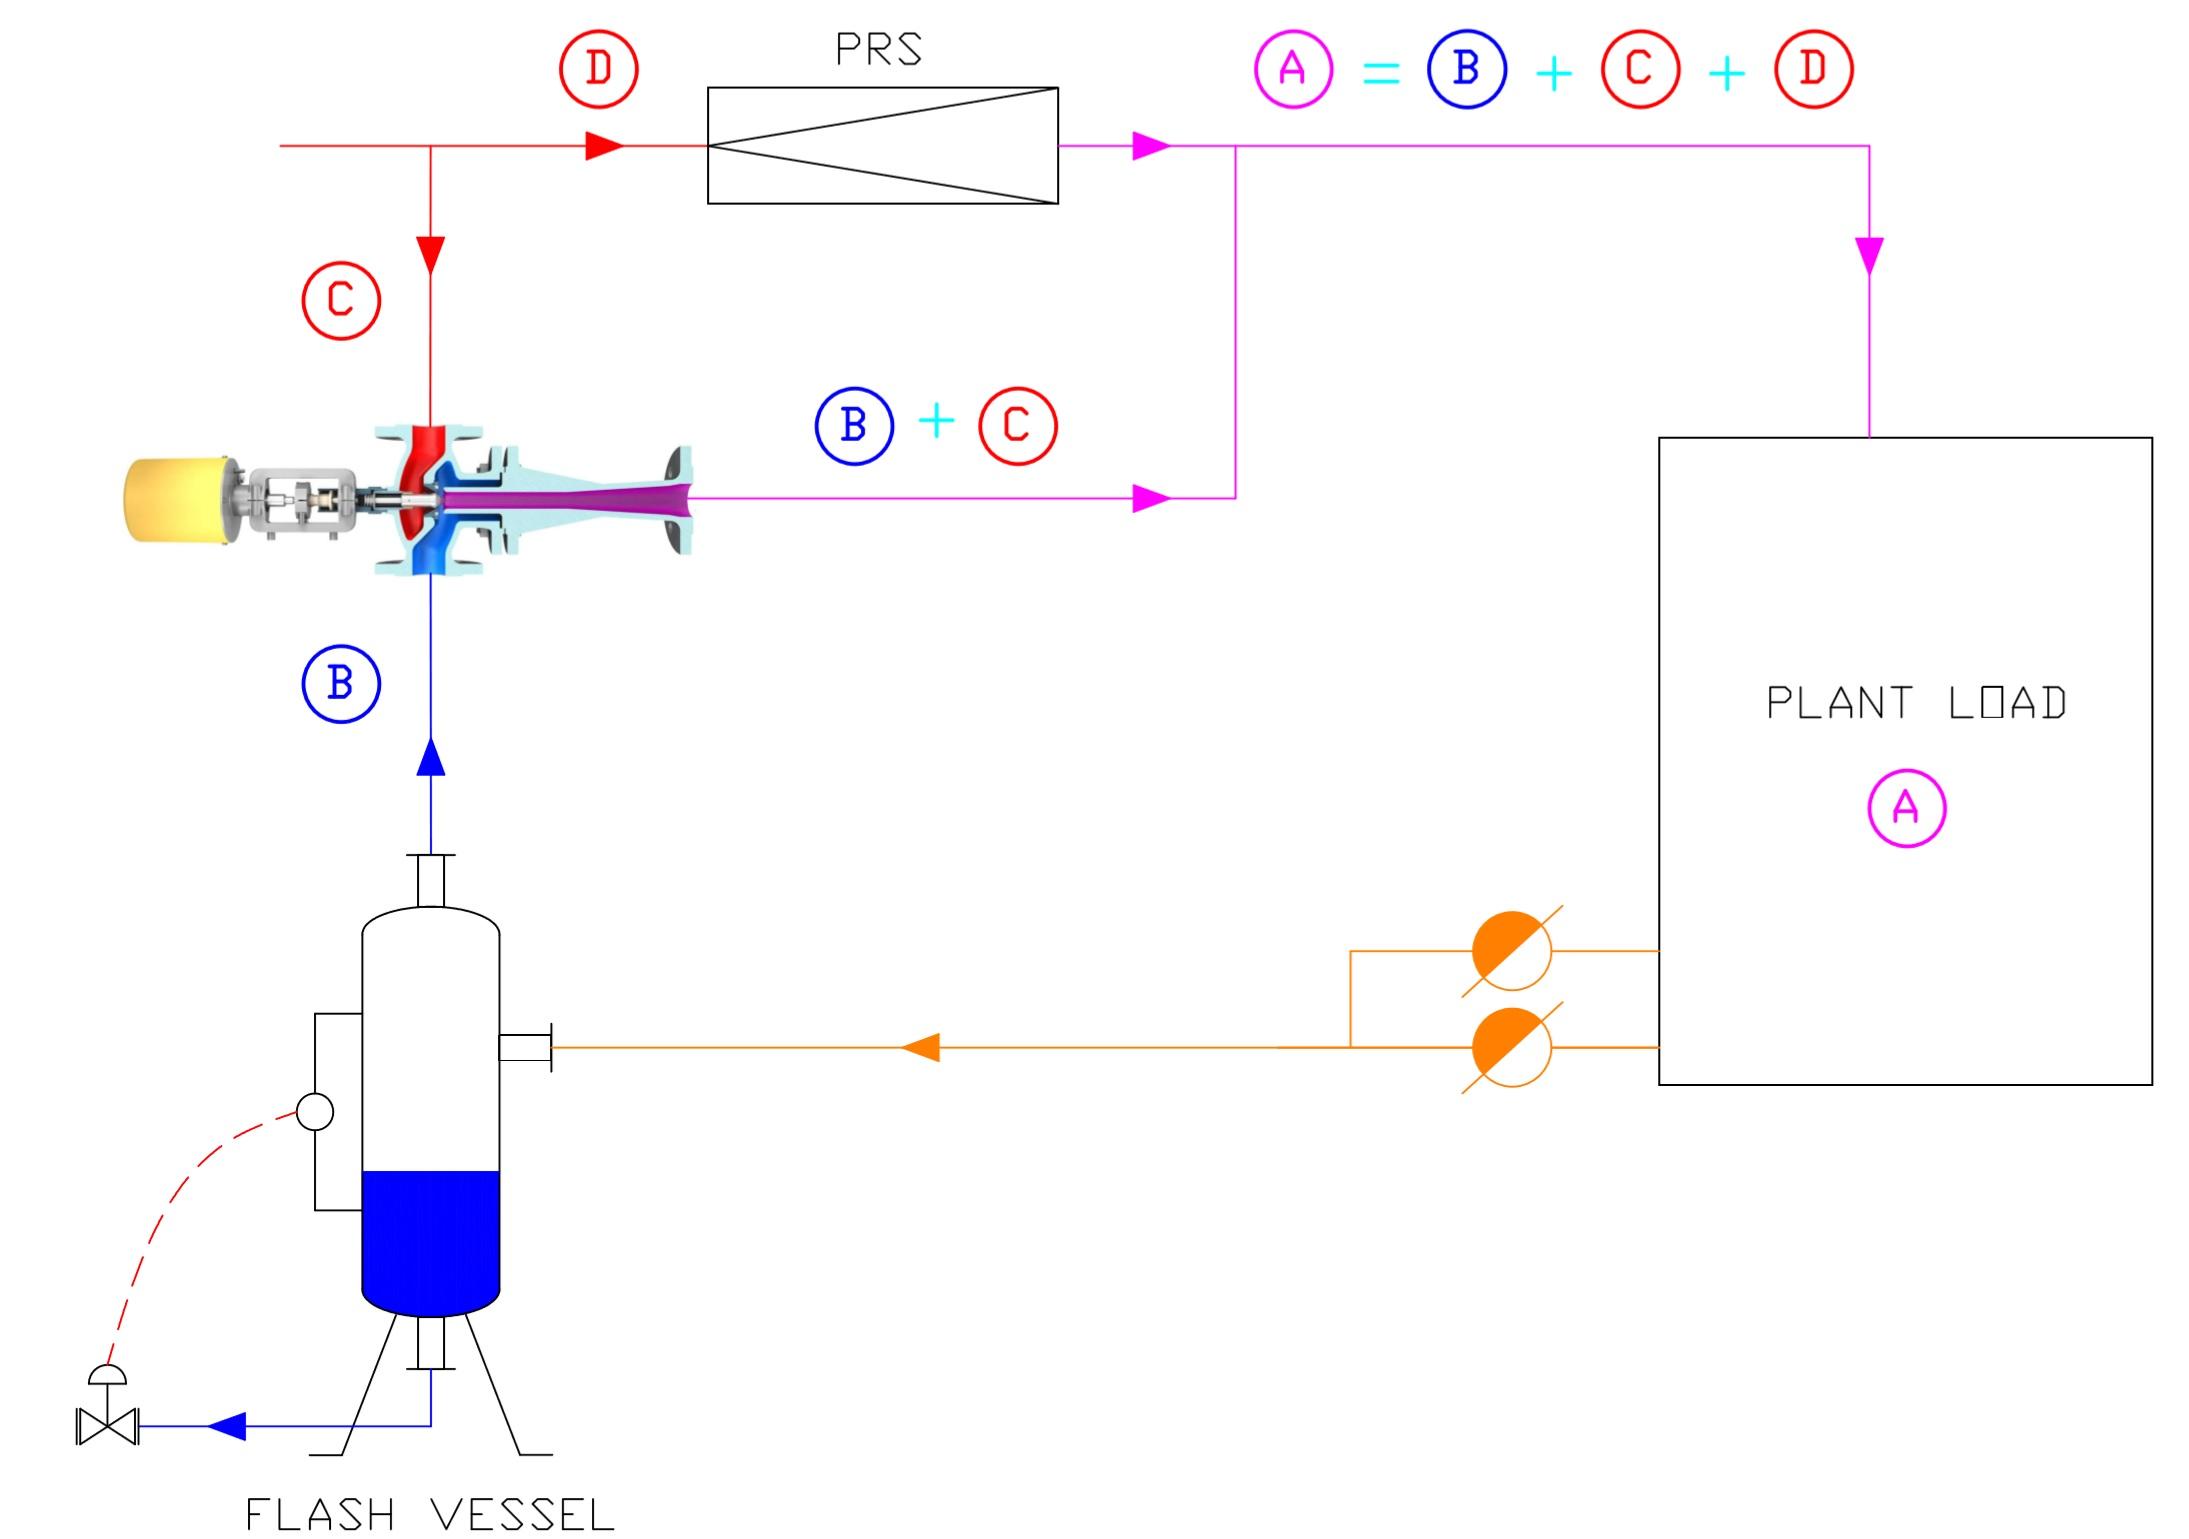 Single Thermocompressor + PRS